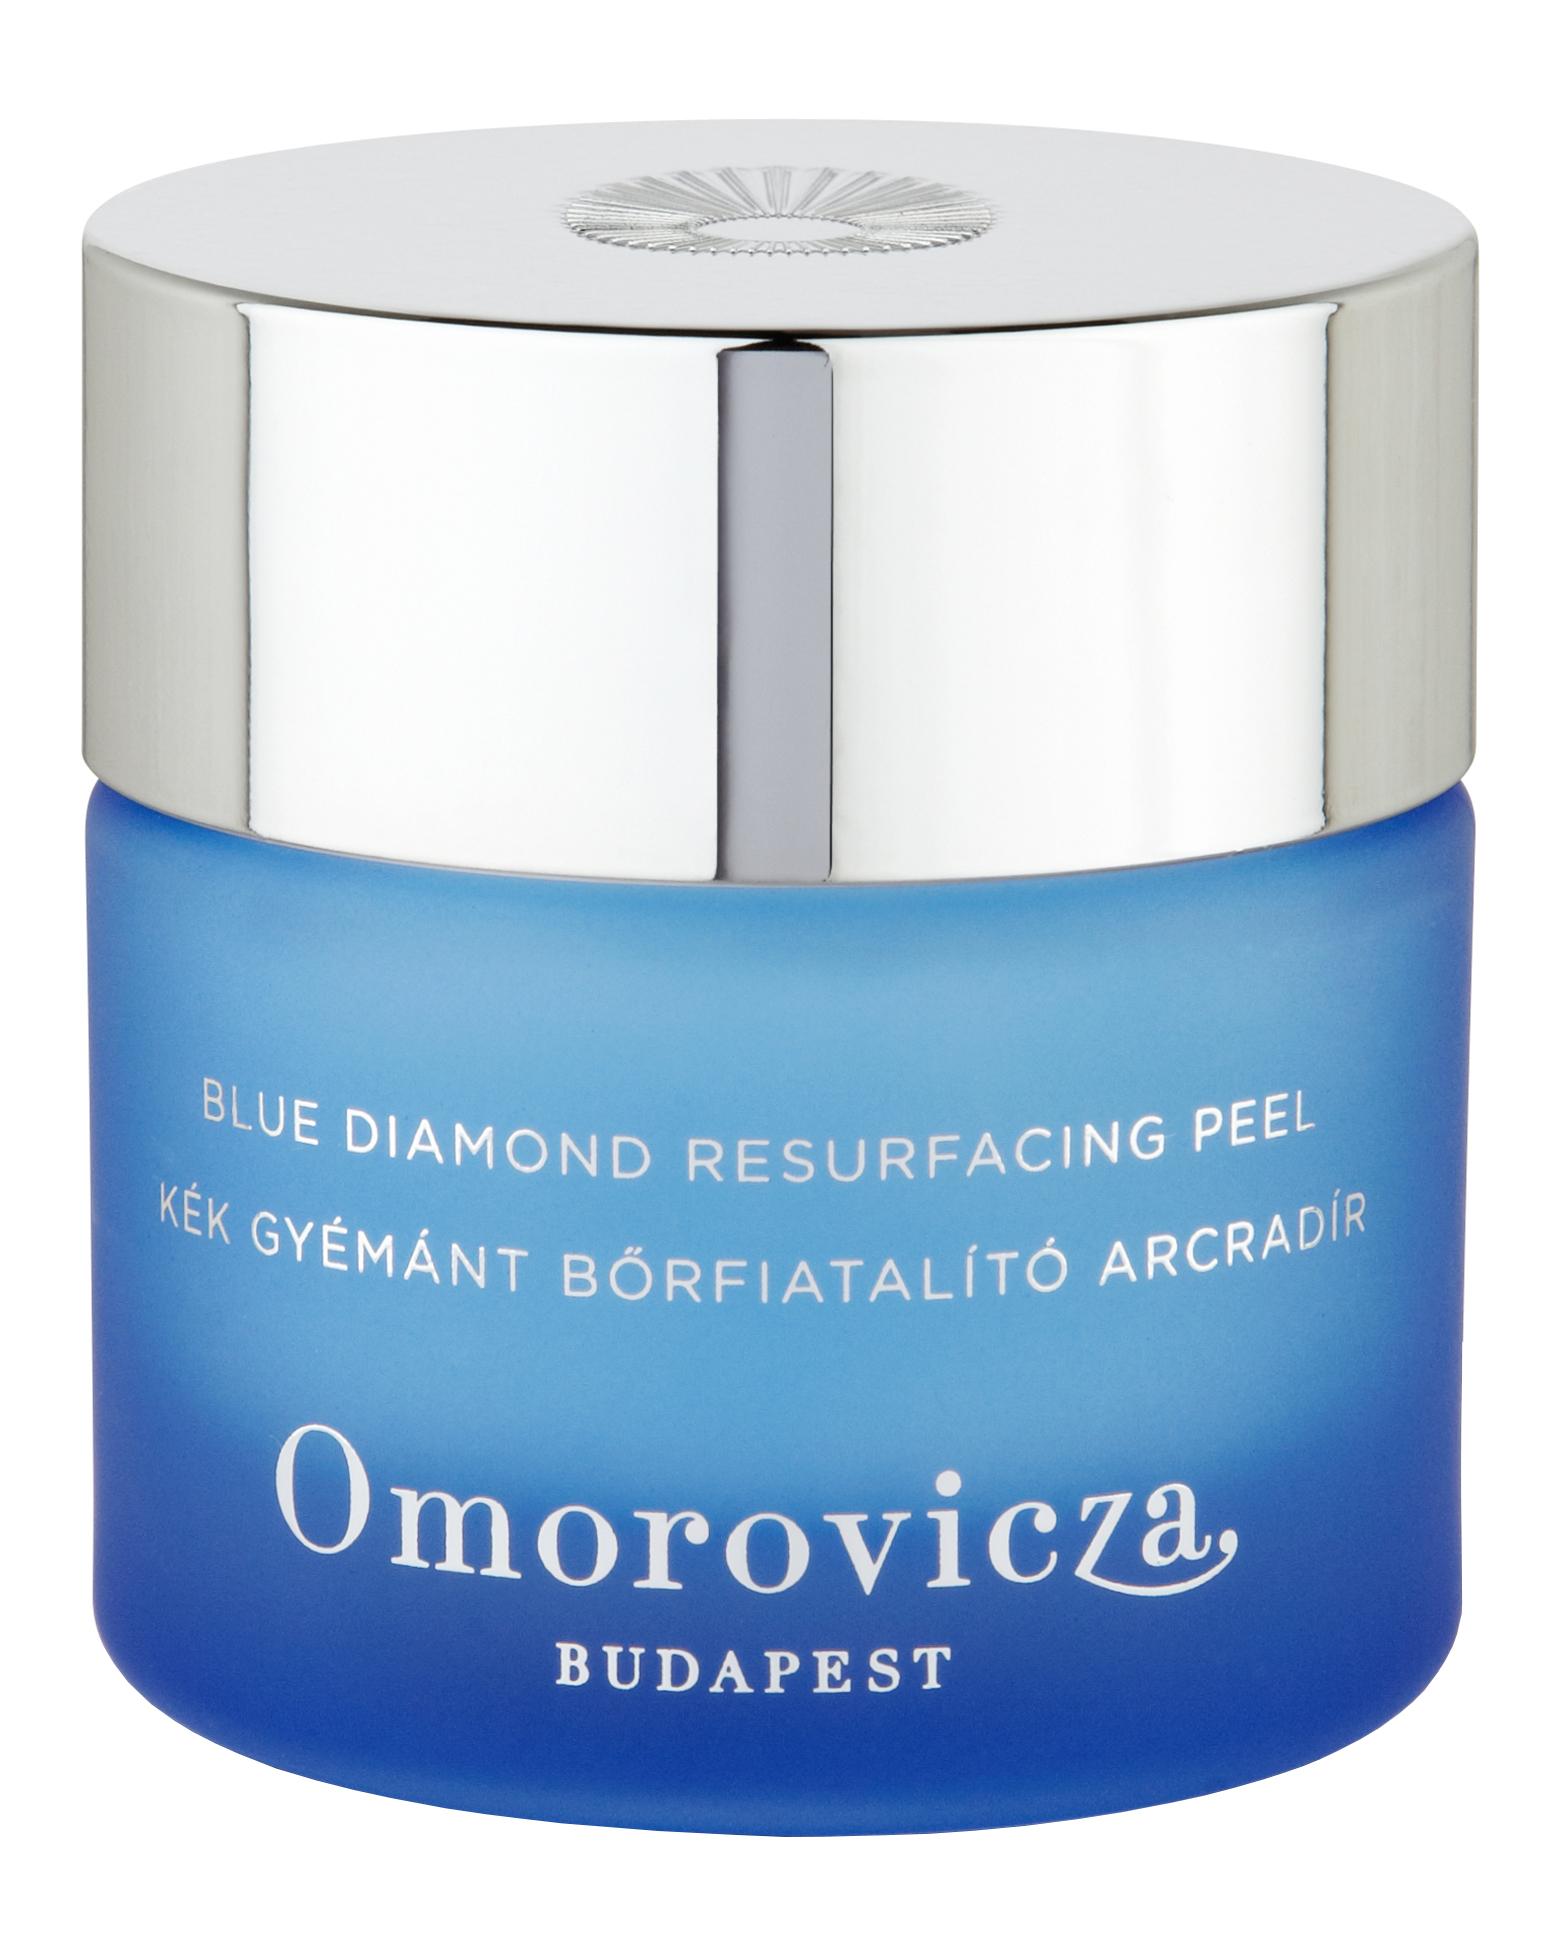 beautysecret.sk, opalescenčný peeling BLUE DIAMOND RESURFACING PEEL Omorovicza, 175€